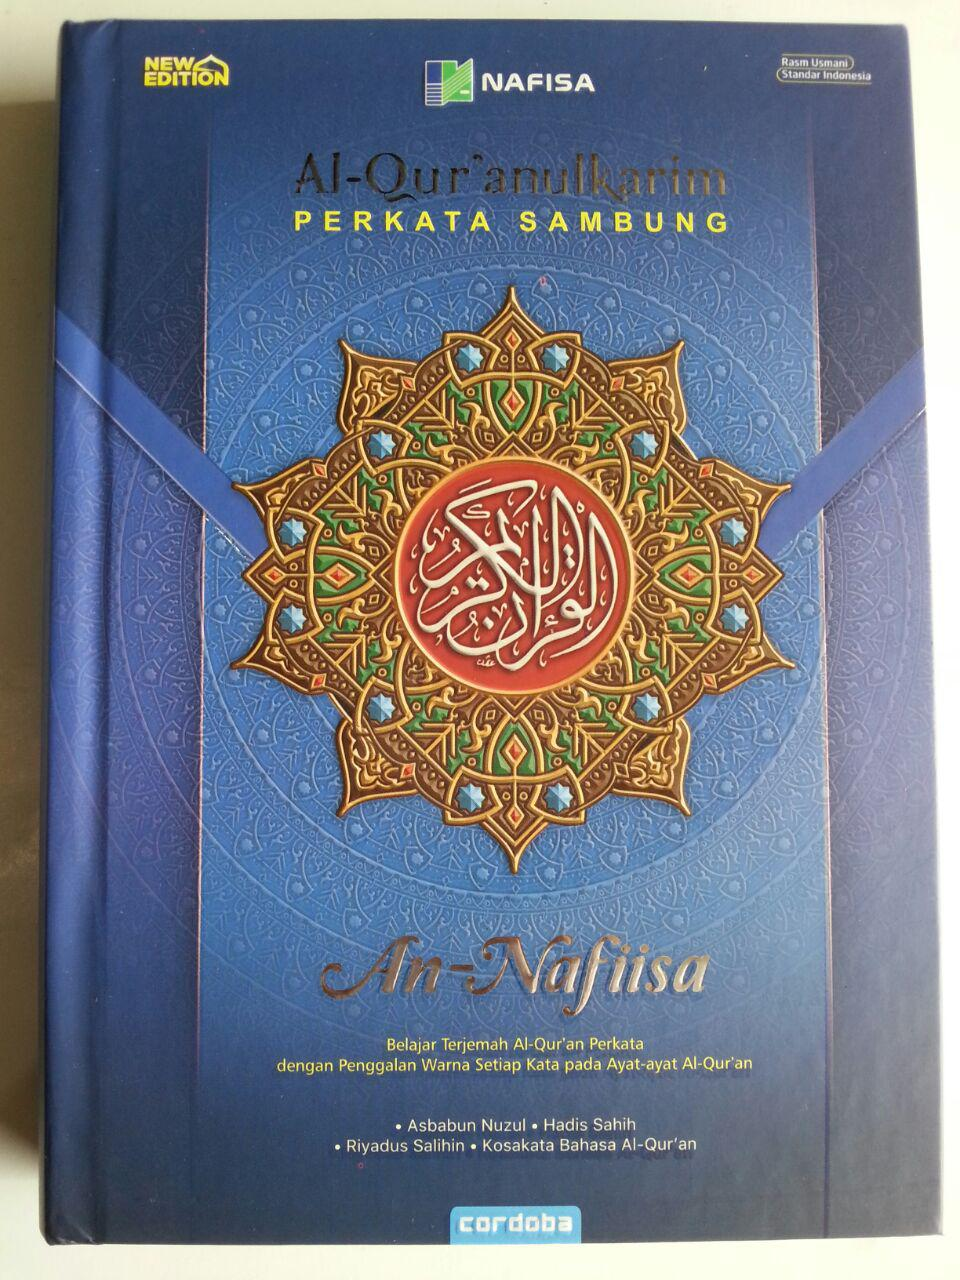 Al-Qur'an Perkata Sambung An-Nafiisa Penggalan Warna Setiap Kata cover 2